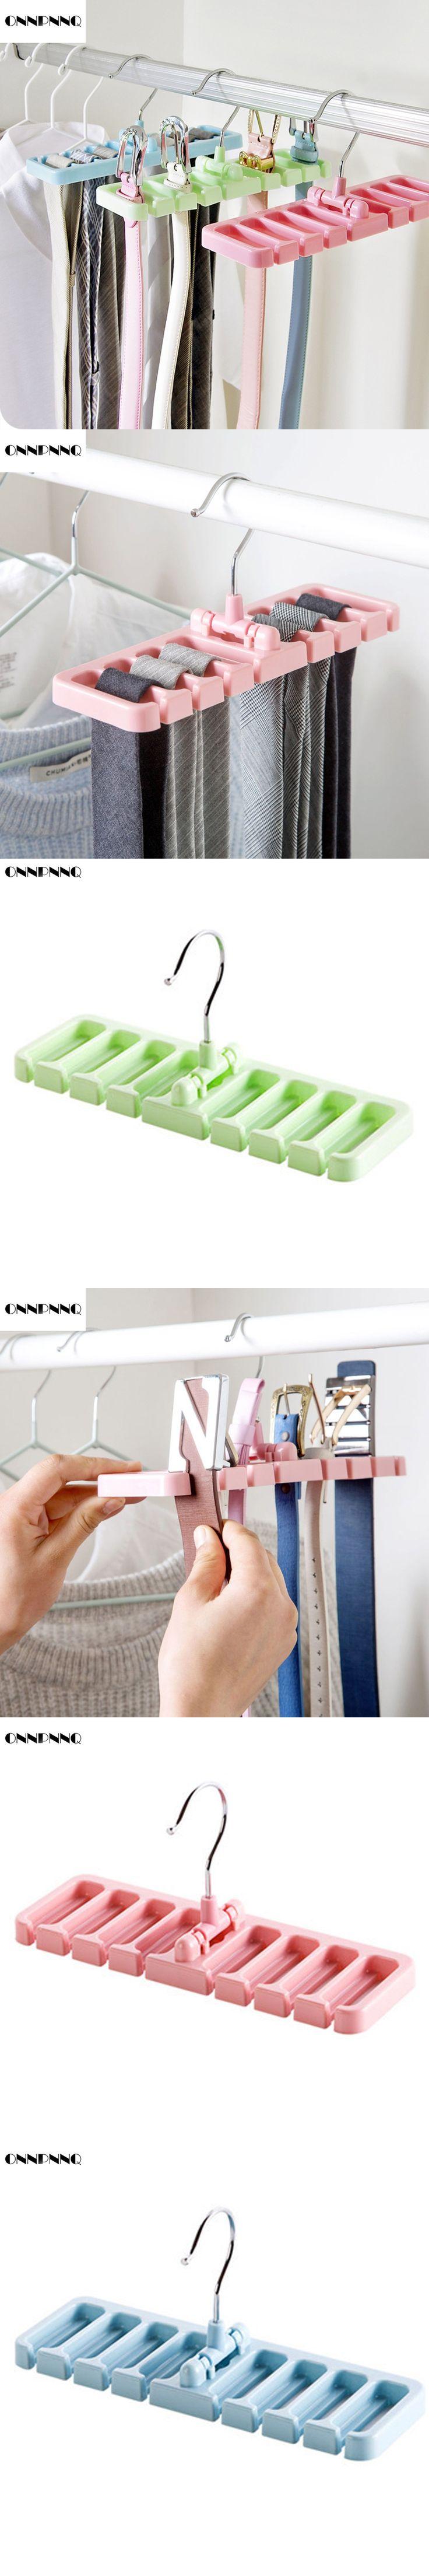 ONNPNNQ Multifuction Rotating Tie Hanger Holder Storage Rack Closet Belt Organization